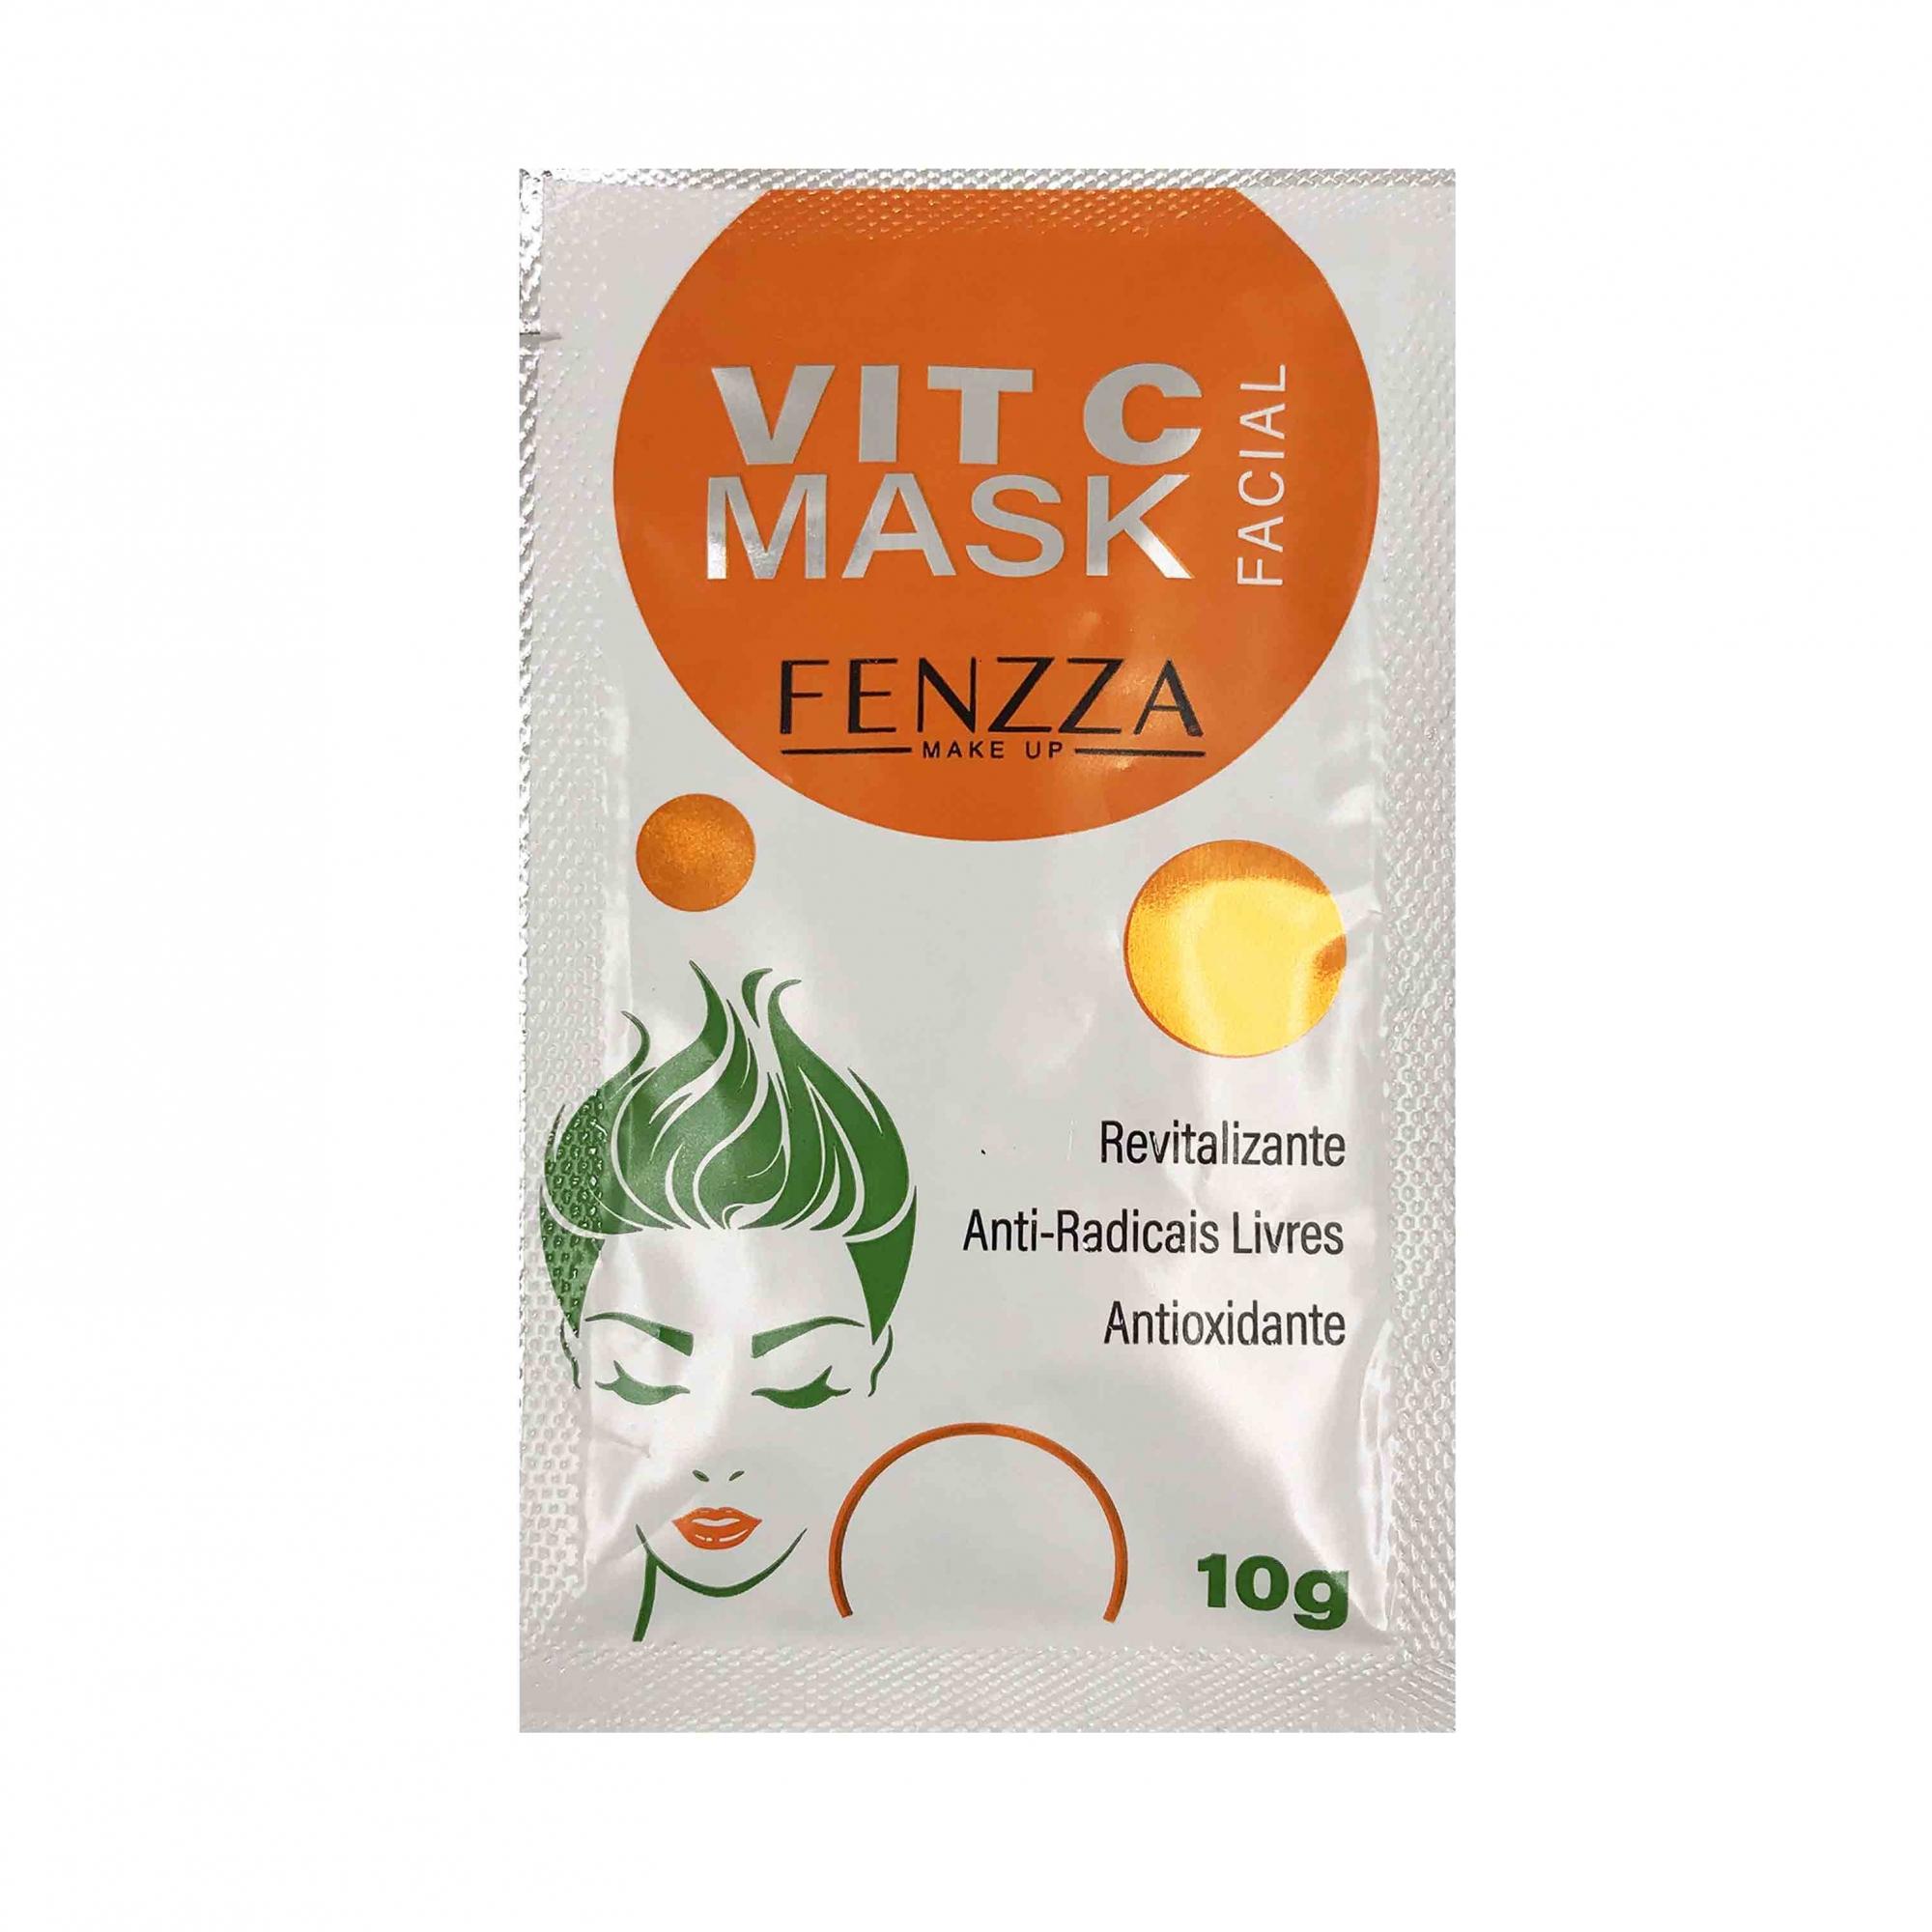 Fenzza VIT C MASK FACIAL